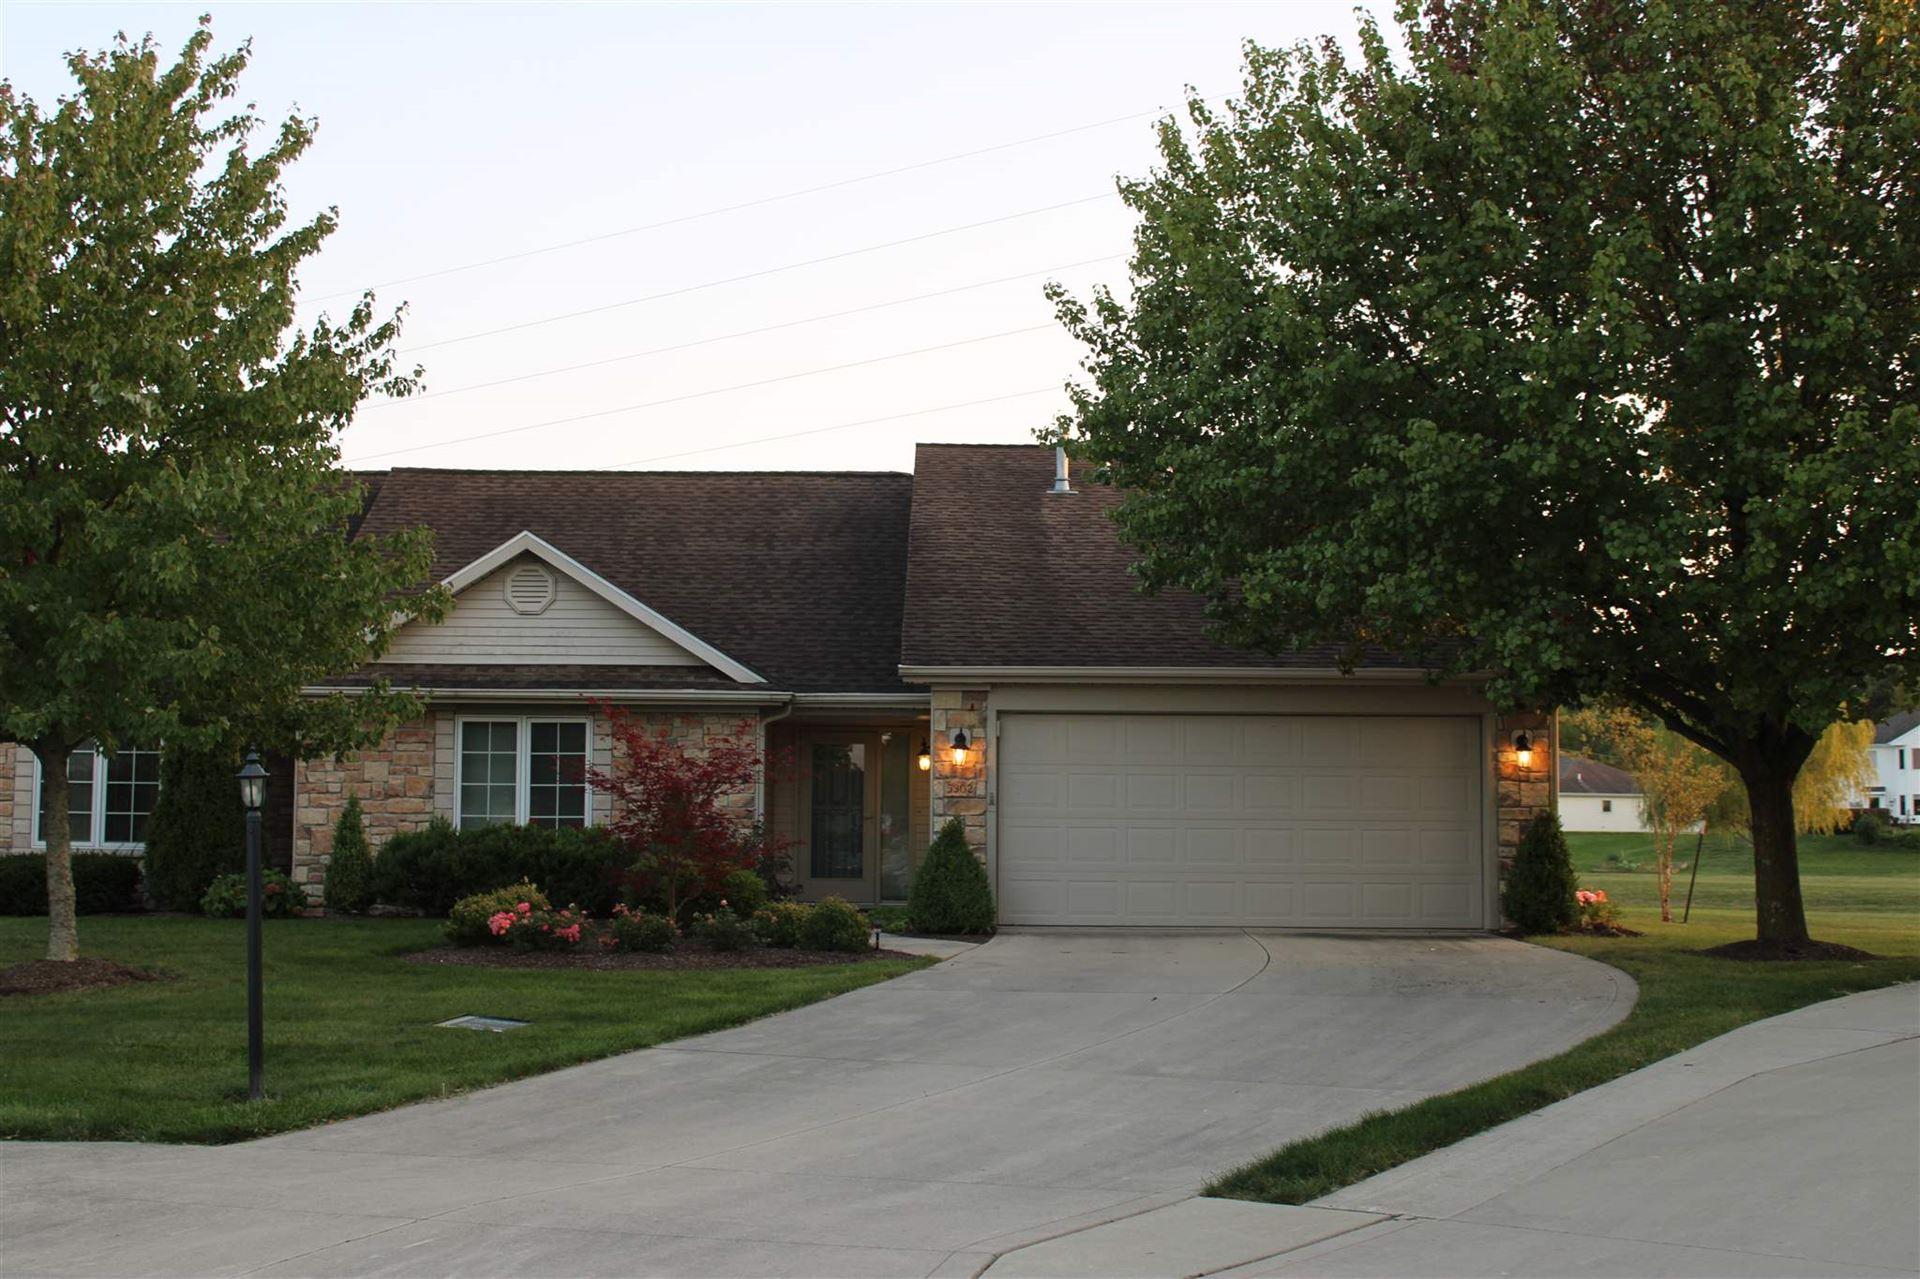 5302 Blossom Ridge, Fort Wayne, IN 46835 - #: 202038404